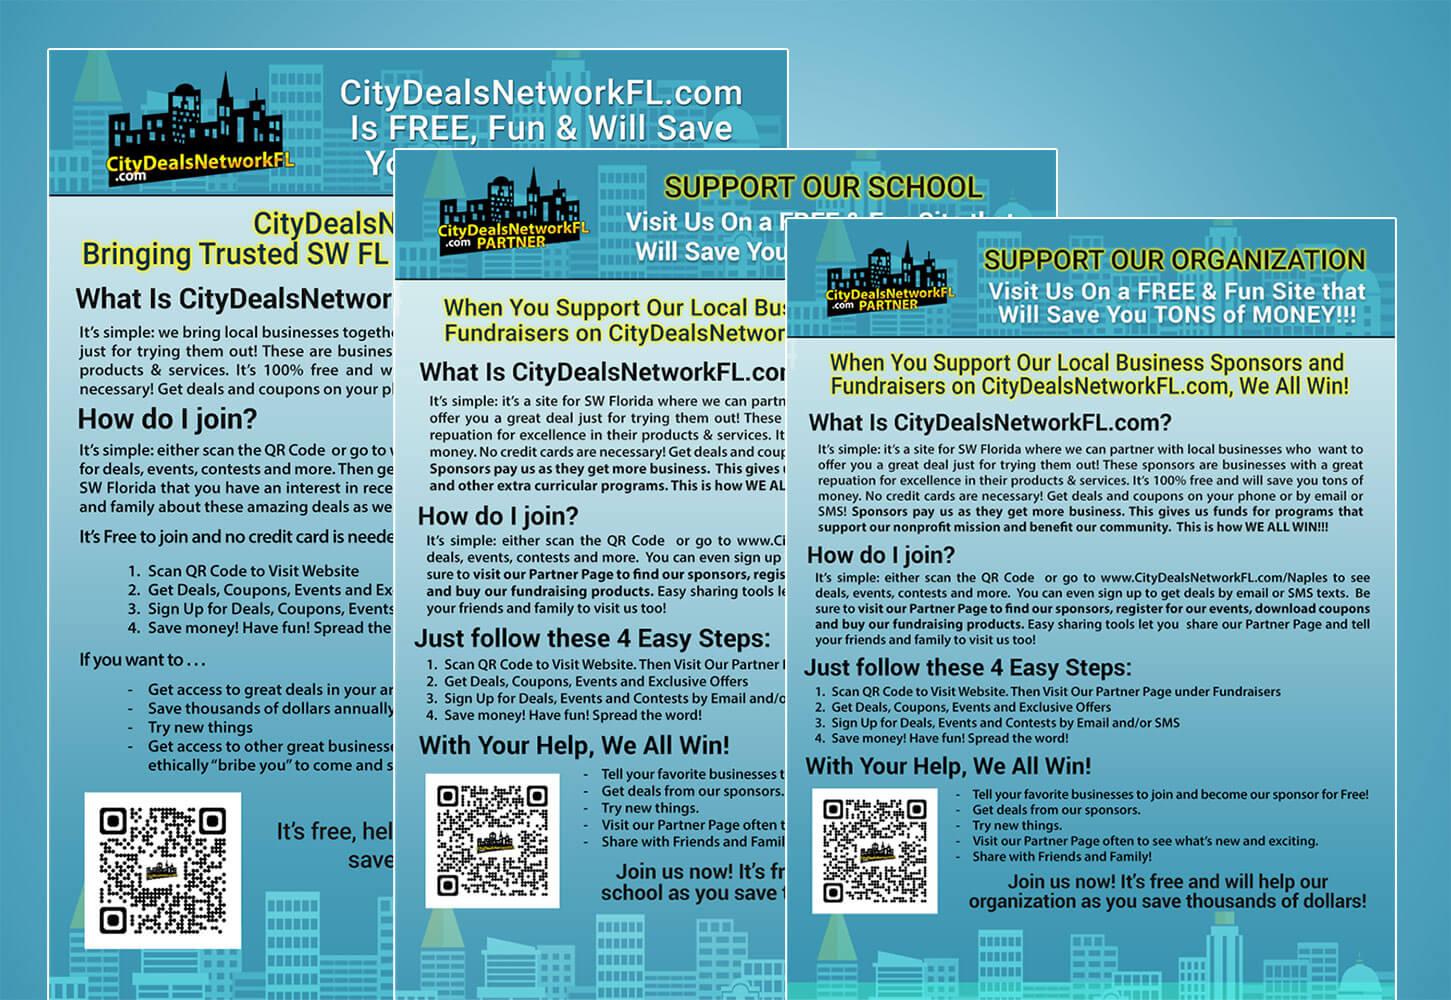 City Deals Network Promotional Flyers